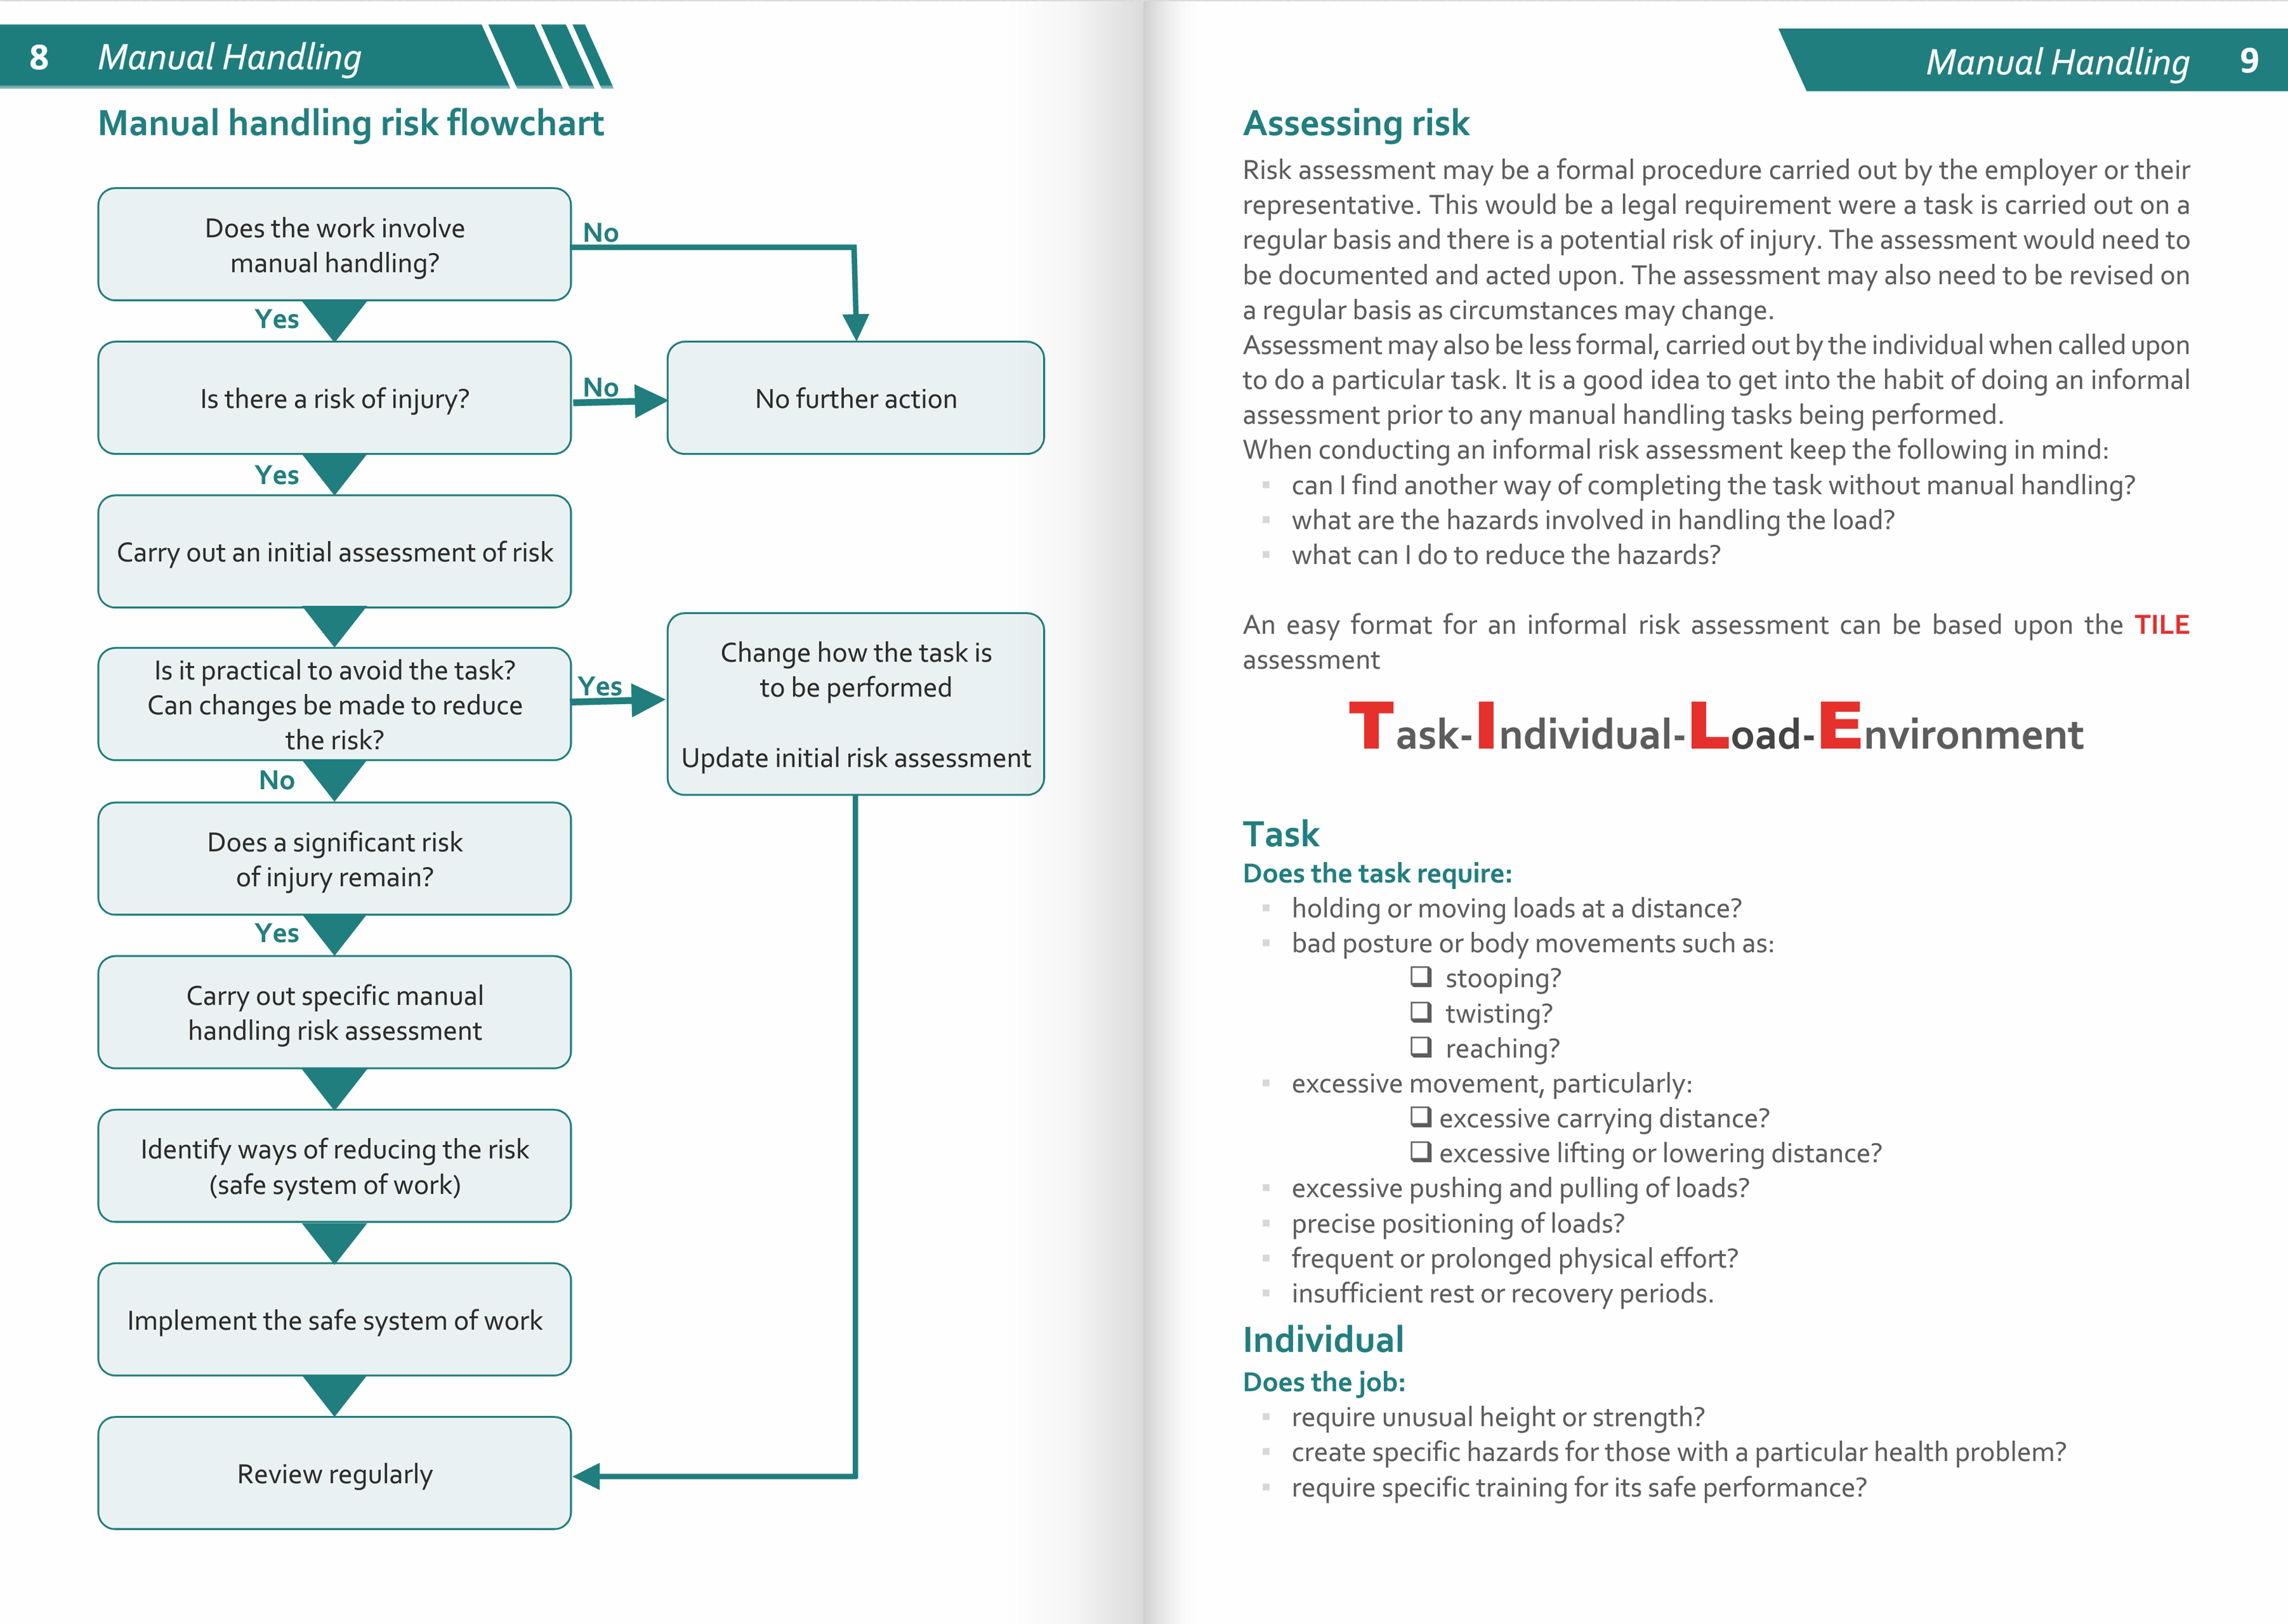 Manual Handling Operations Handbook 2nd Edition – Manual Handling Risk Assessment